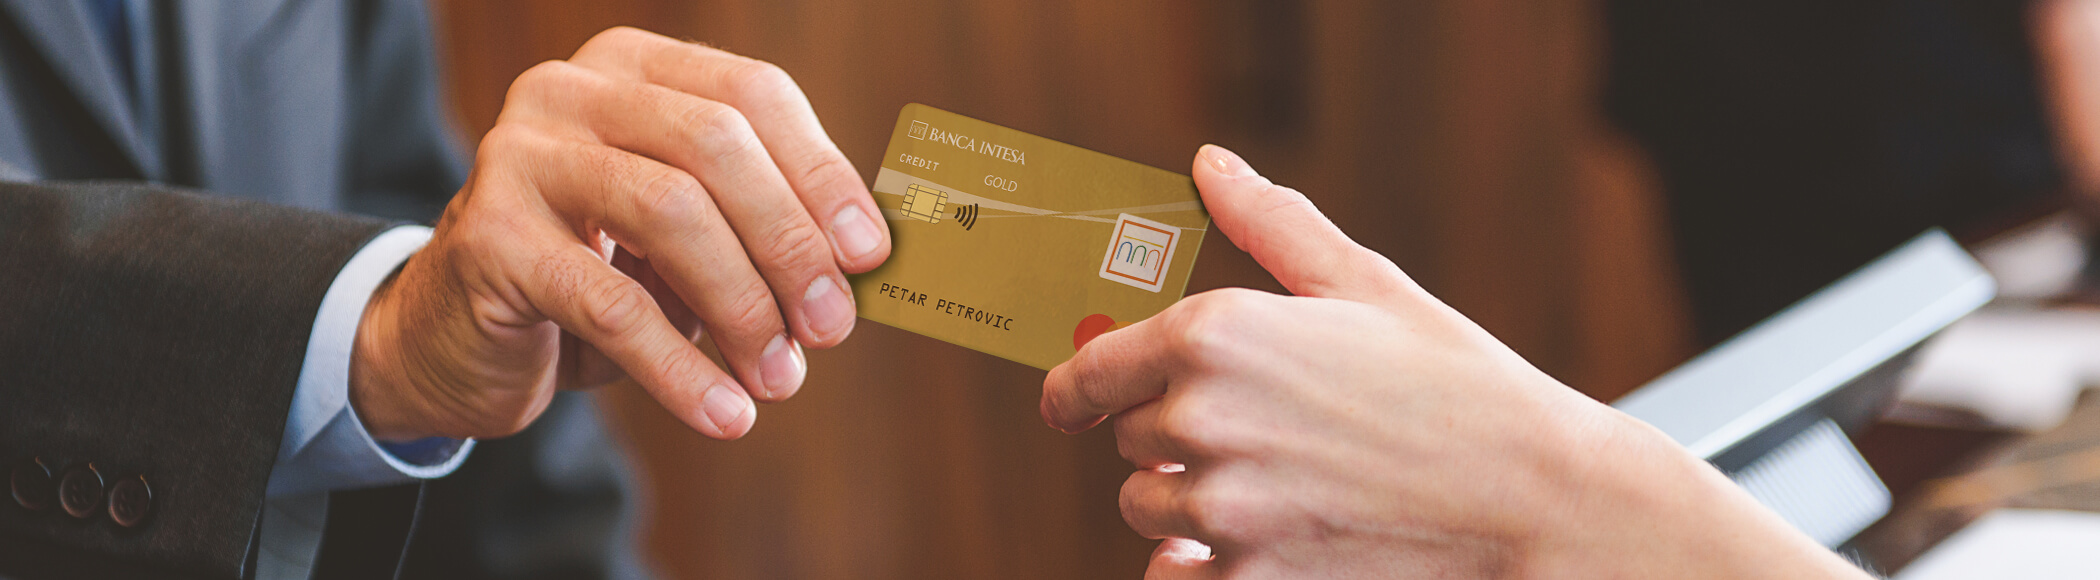 Mastercard Gold kreditna kartica